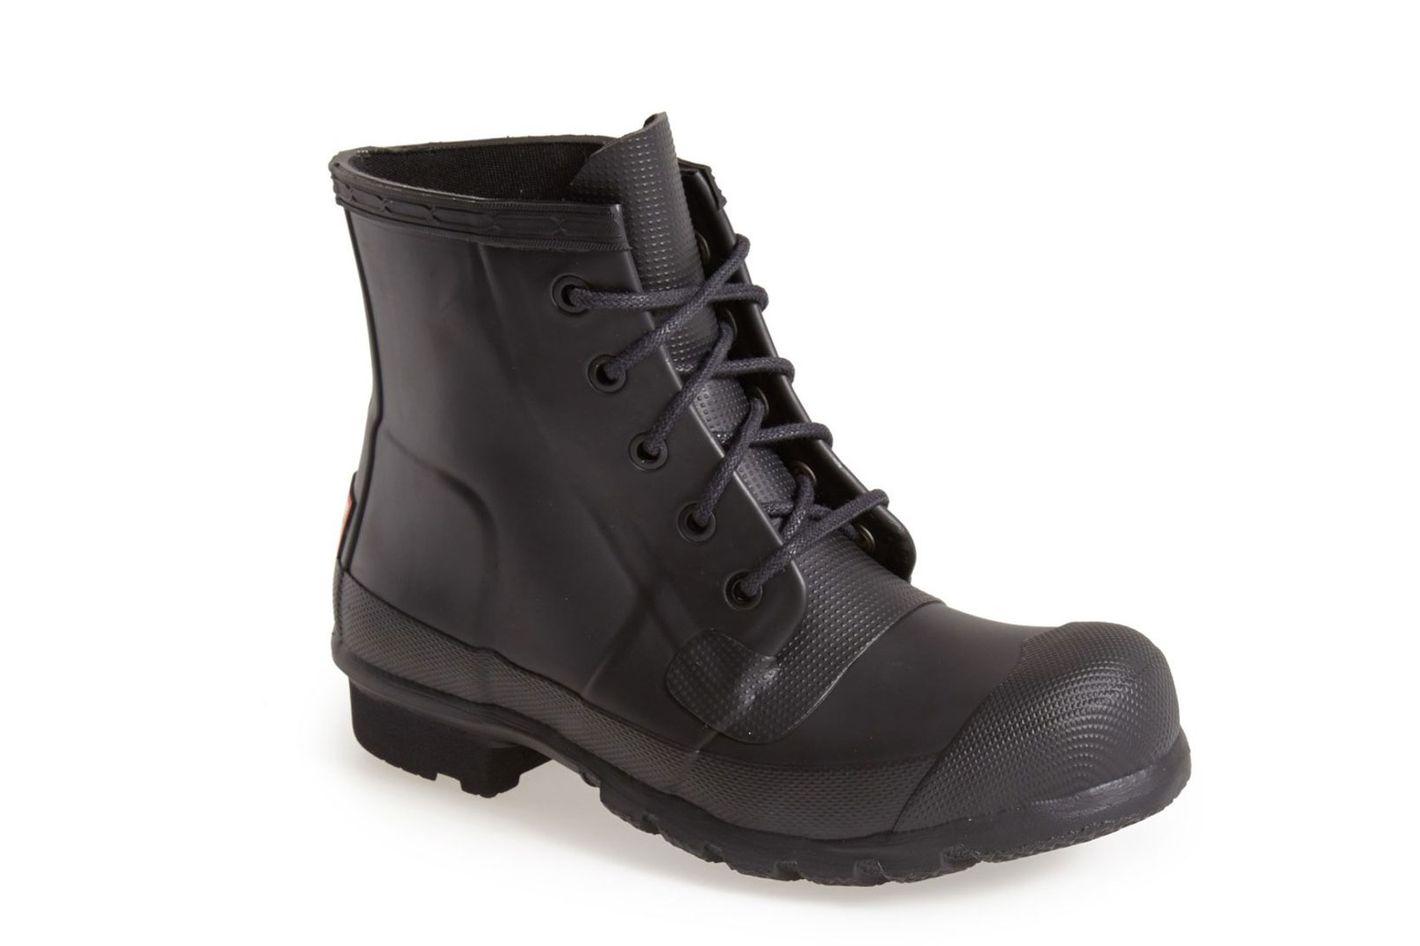 Hunter Original Waterproof Lace-Up Boot